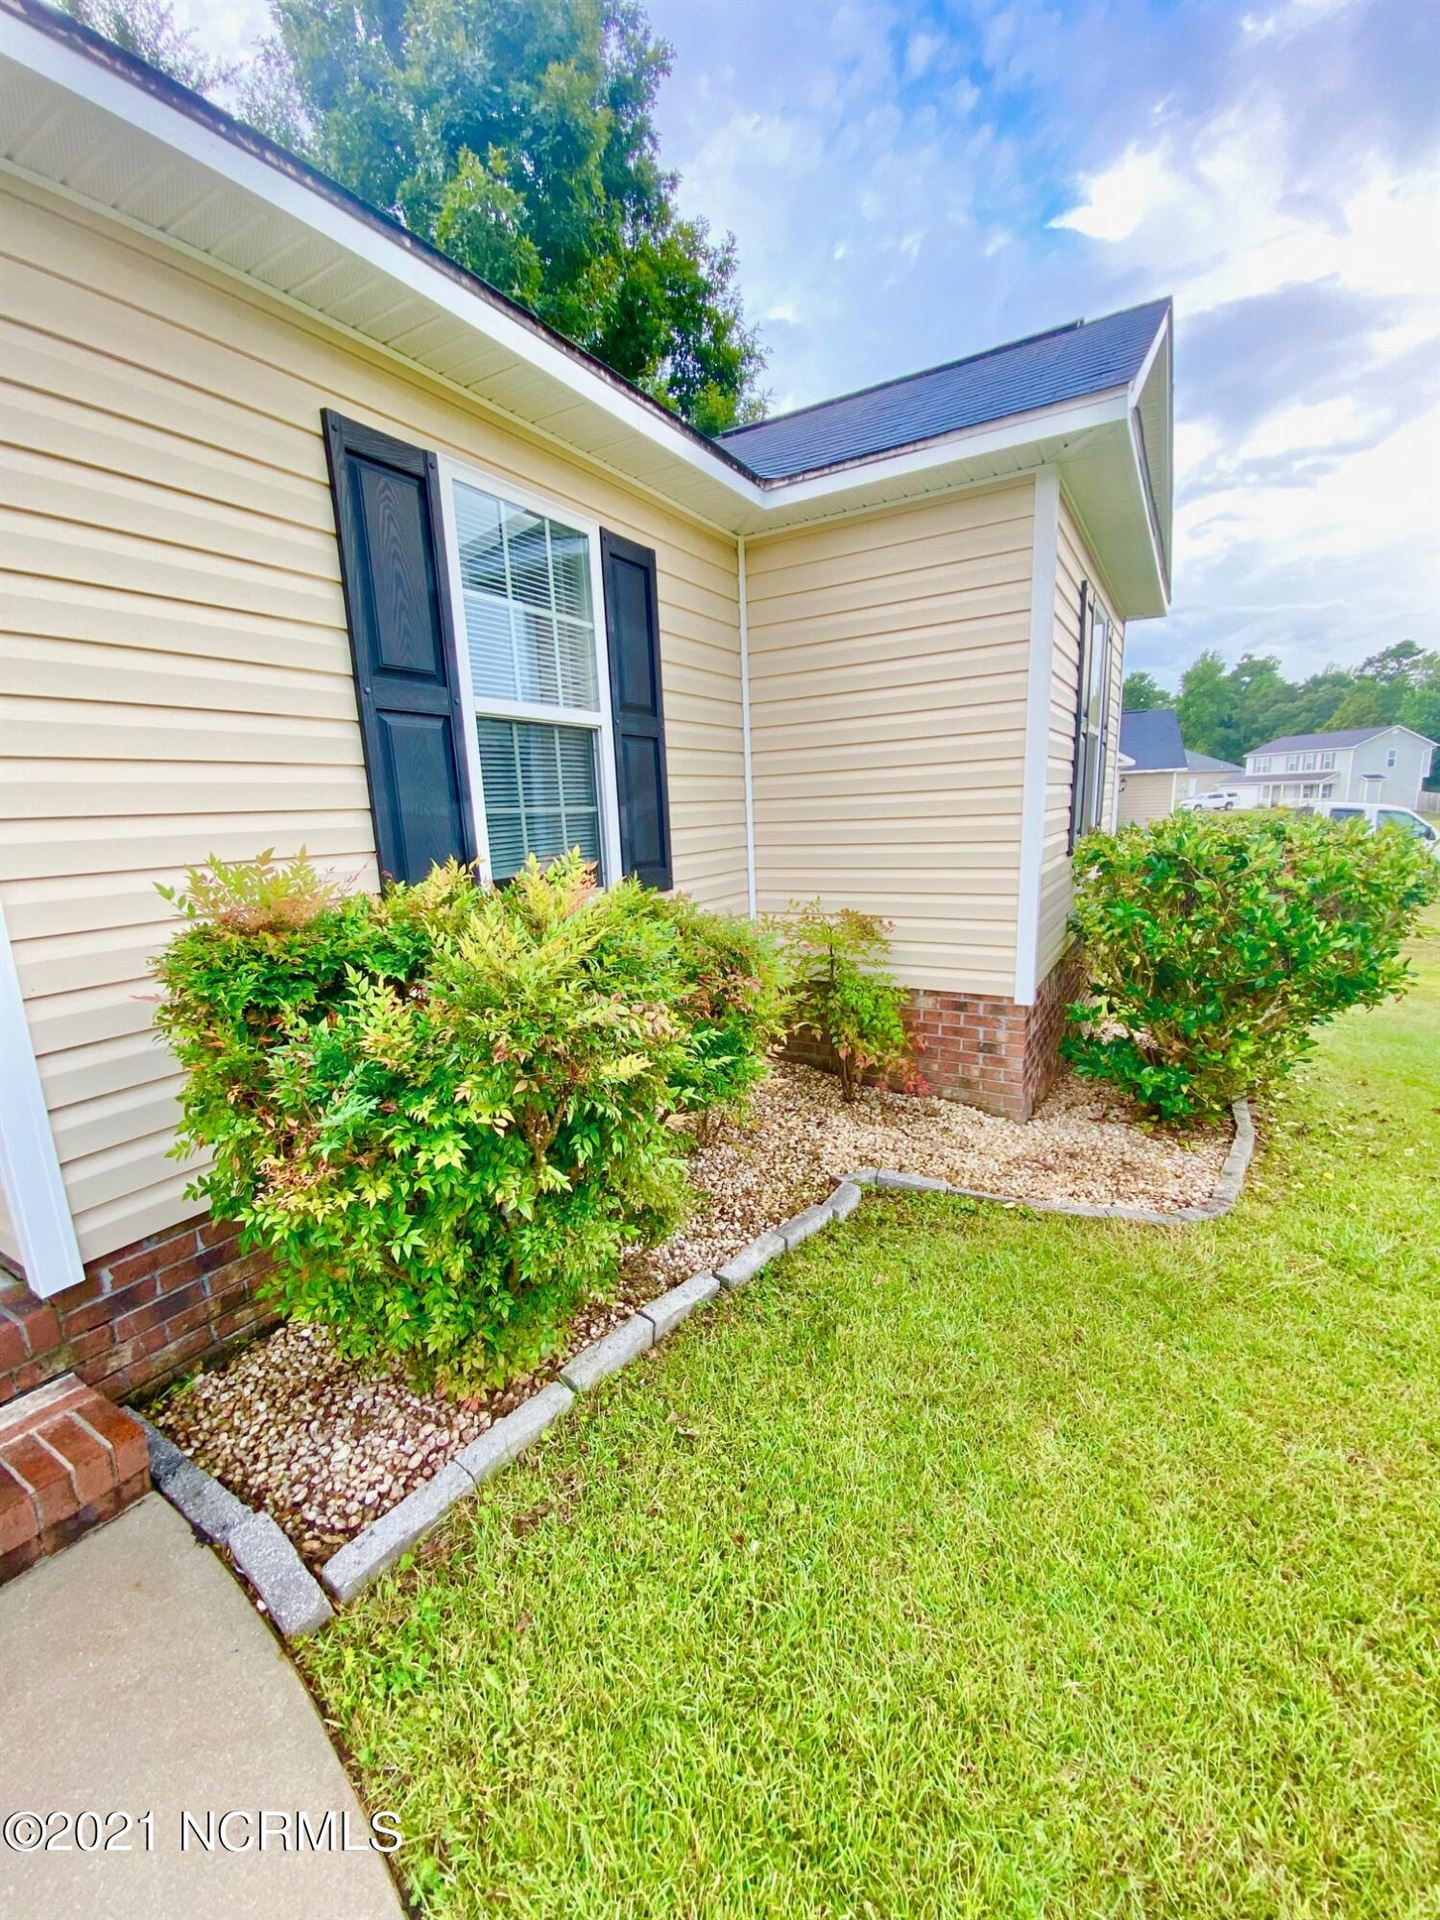 Photo of 288 Brookstone Way, Jacksonville, NC 28546 (MLS # 100291356)